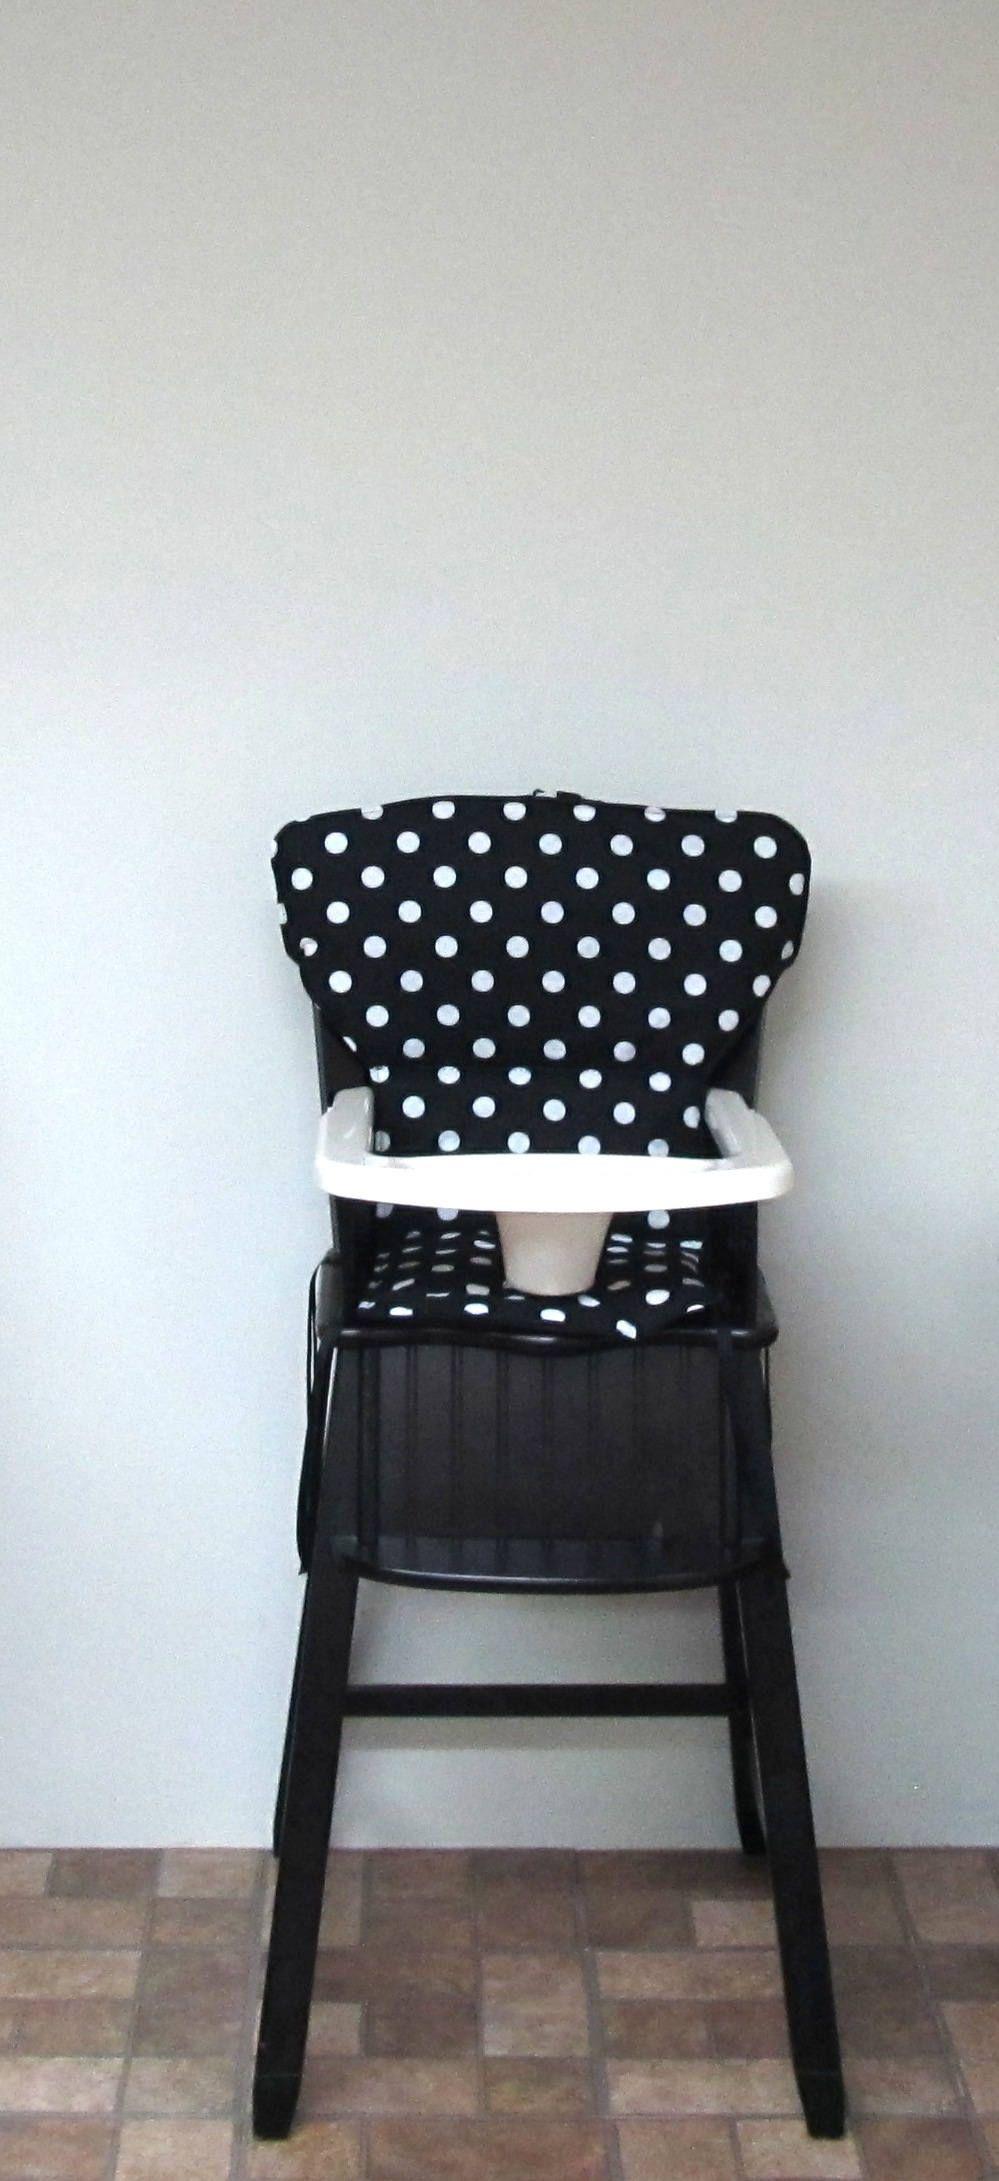 Eddie Bauer wood high chair cover newport style chair